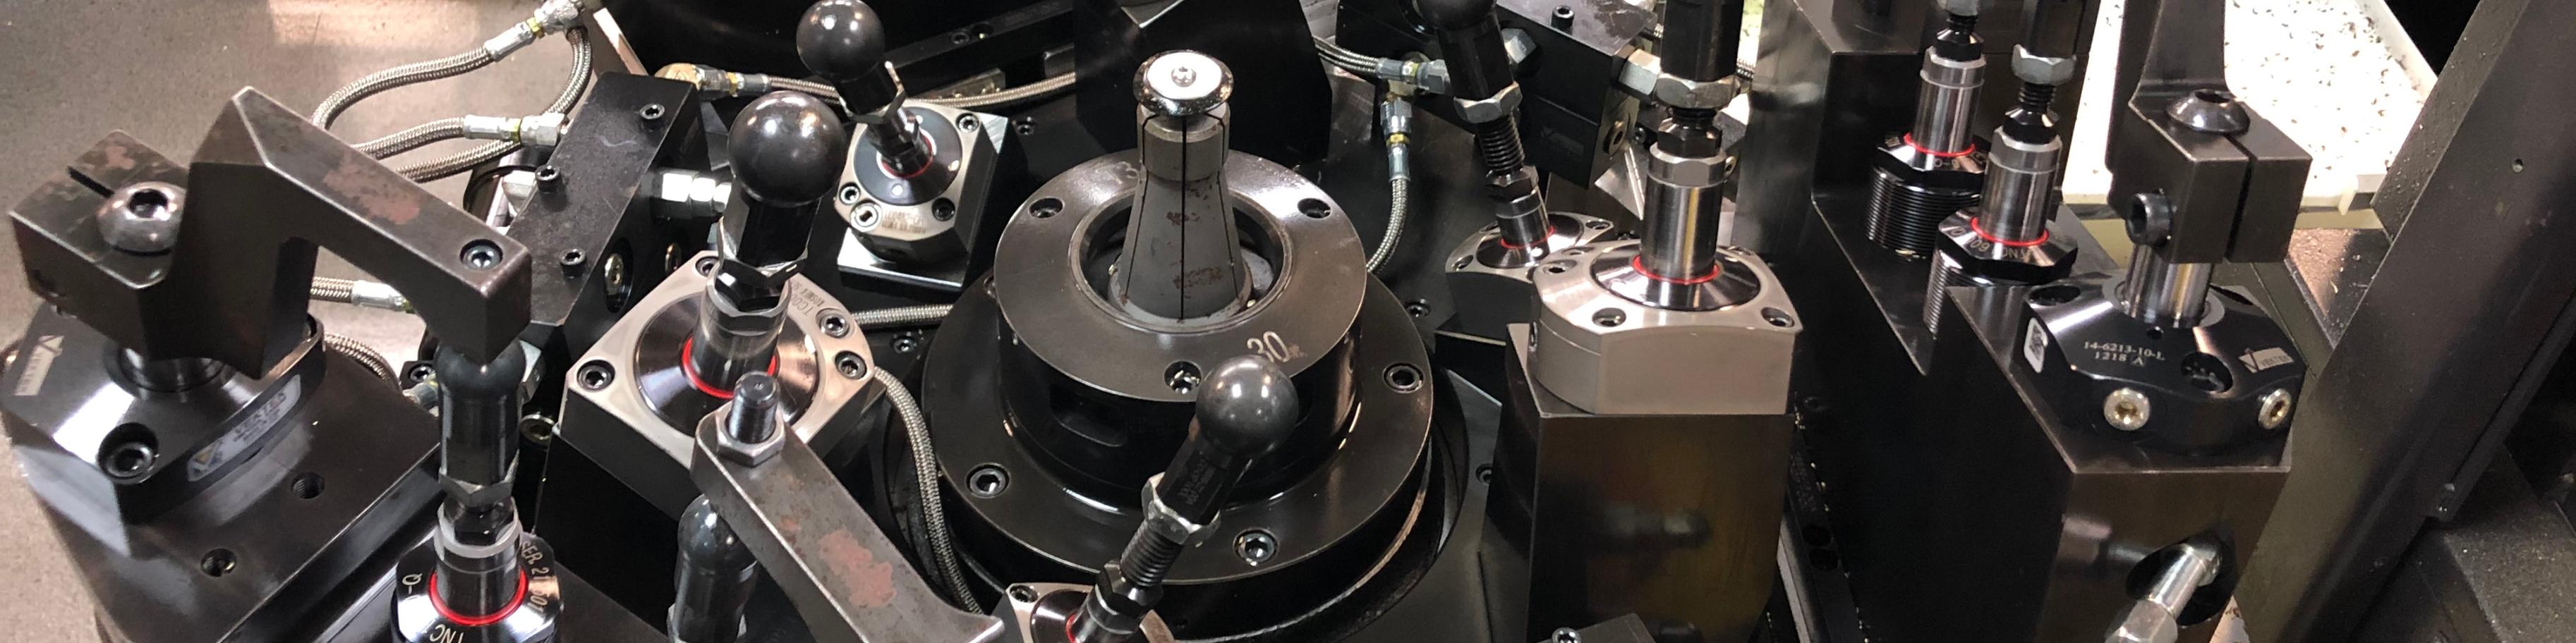 XL Machine CNC machining fixture